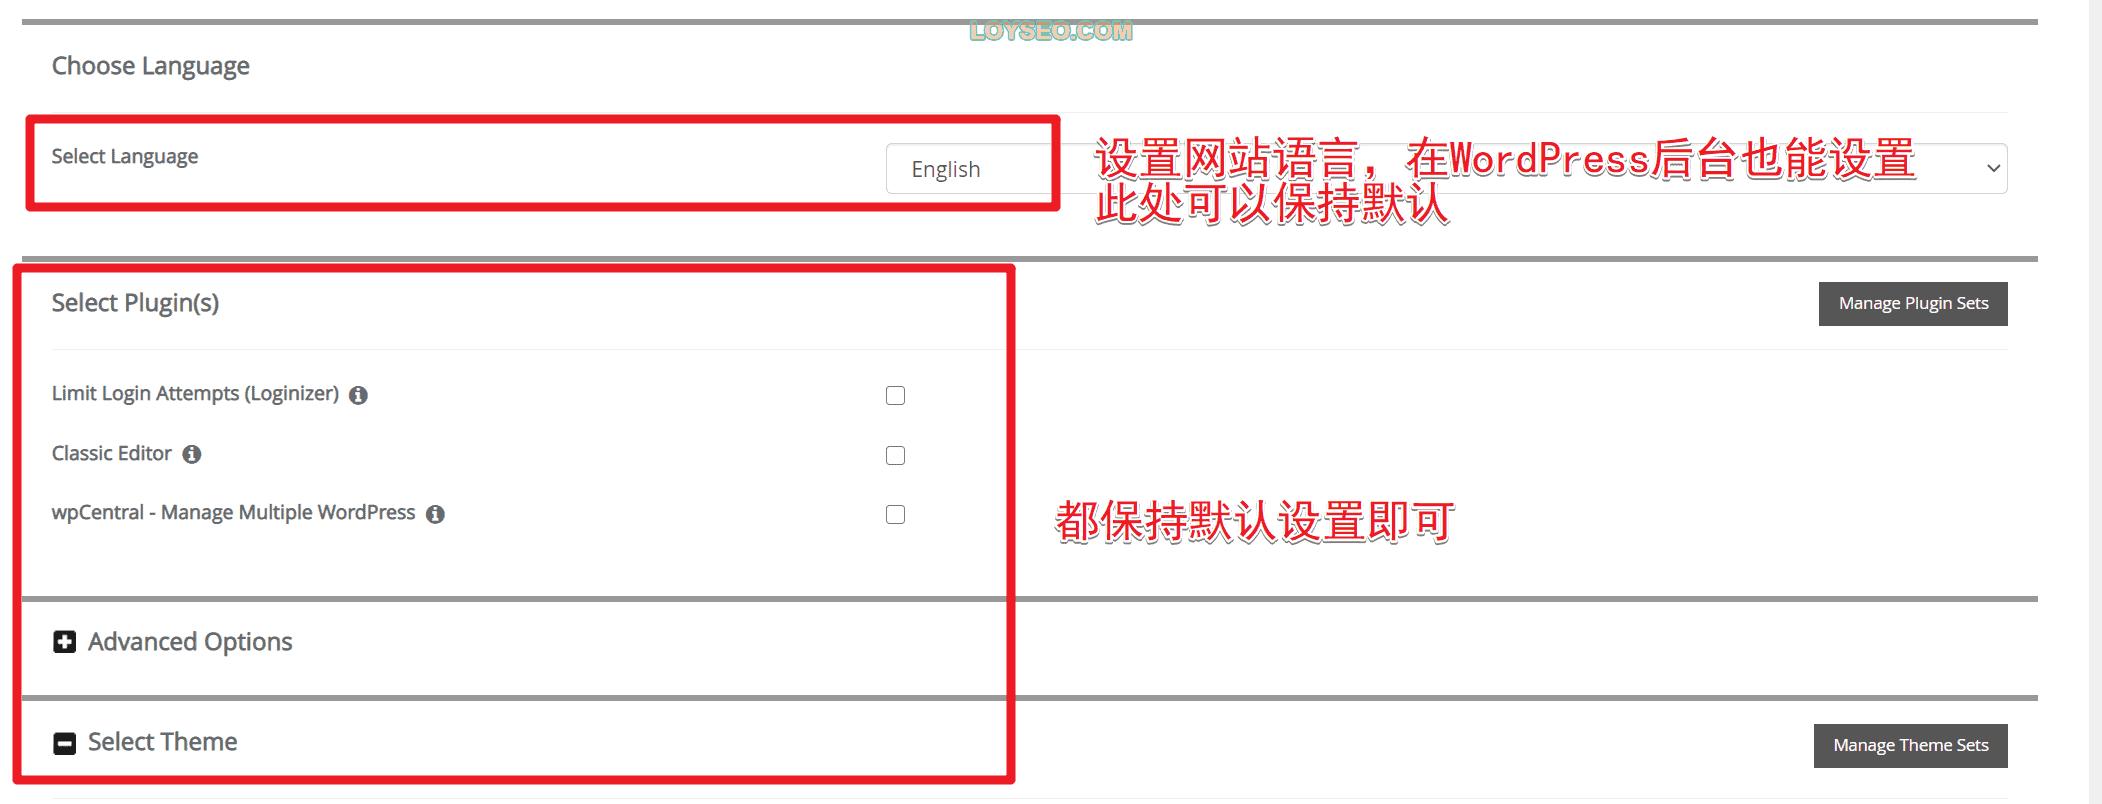 image 45 - ChemiCloud主机测评、选购要点、建外贸网站教程